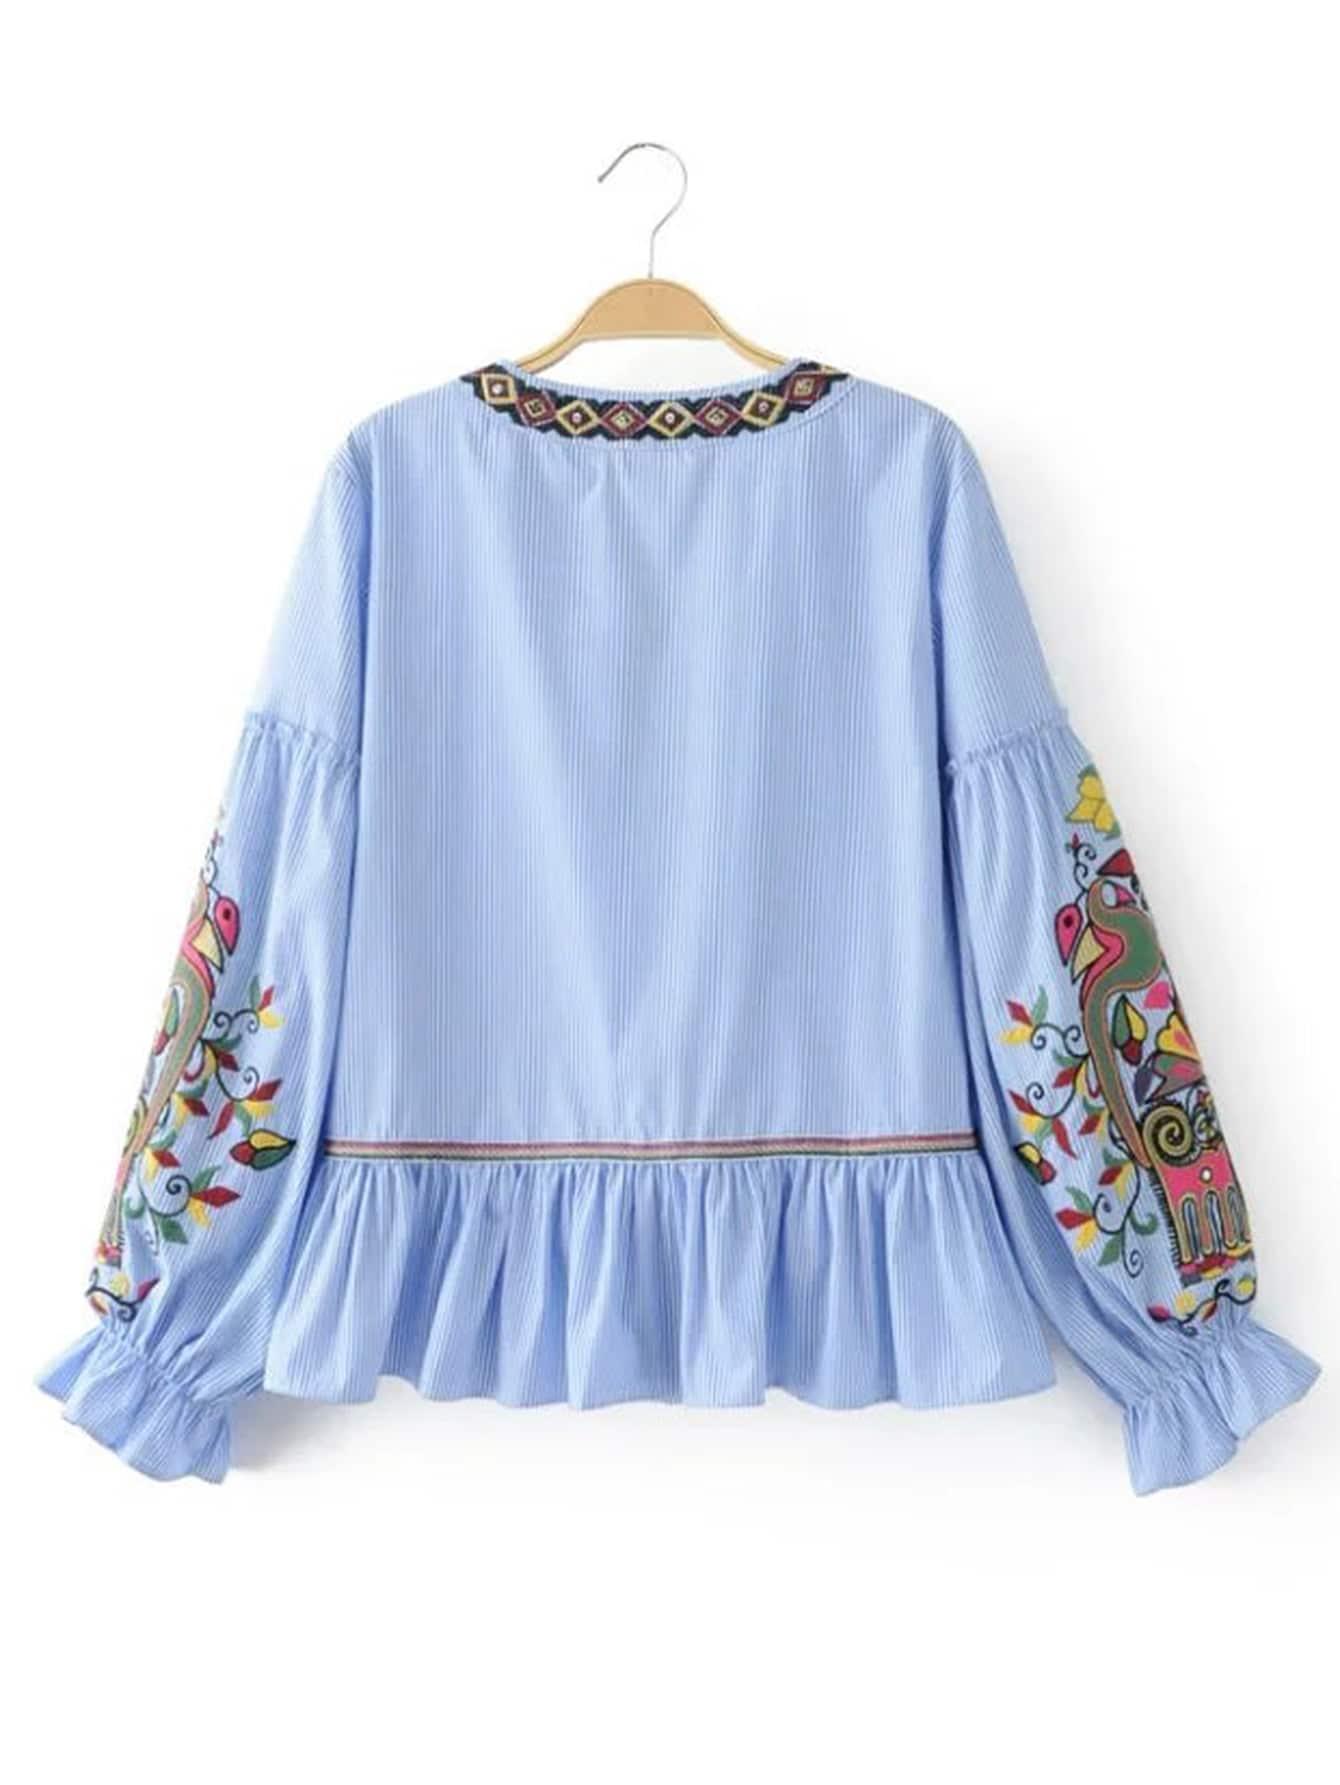 blouse170428205_2